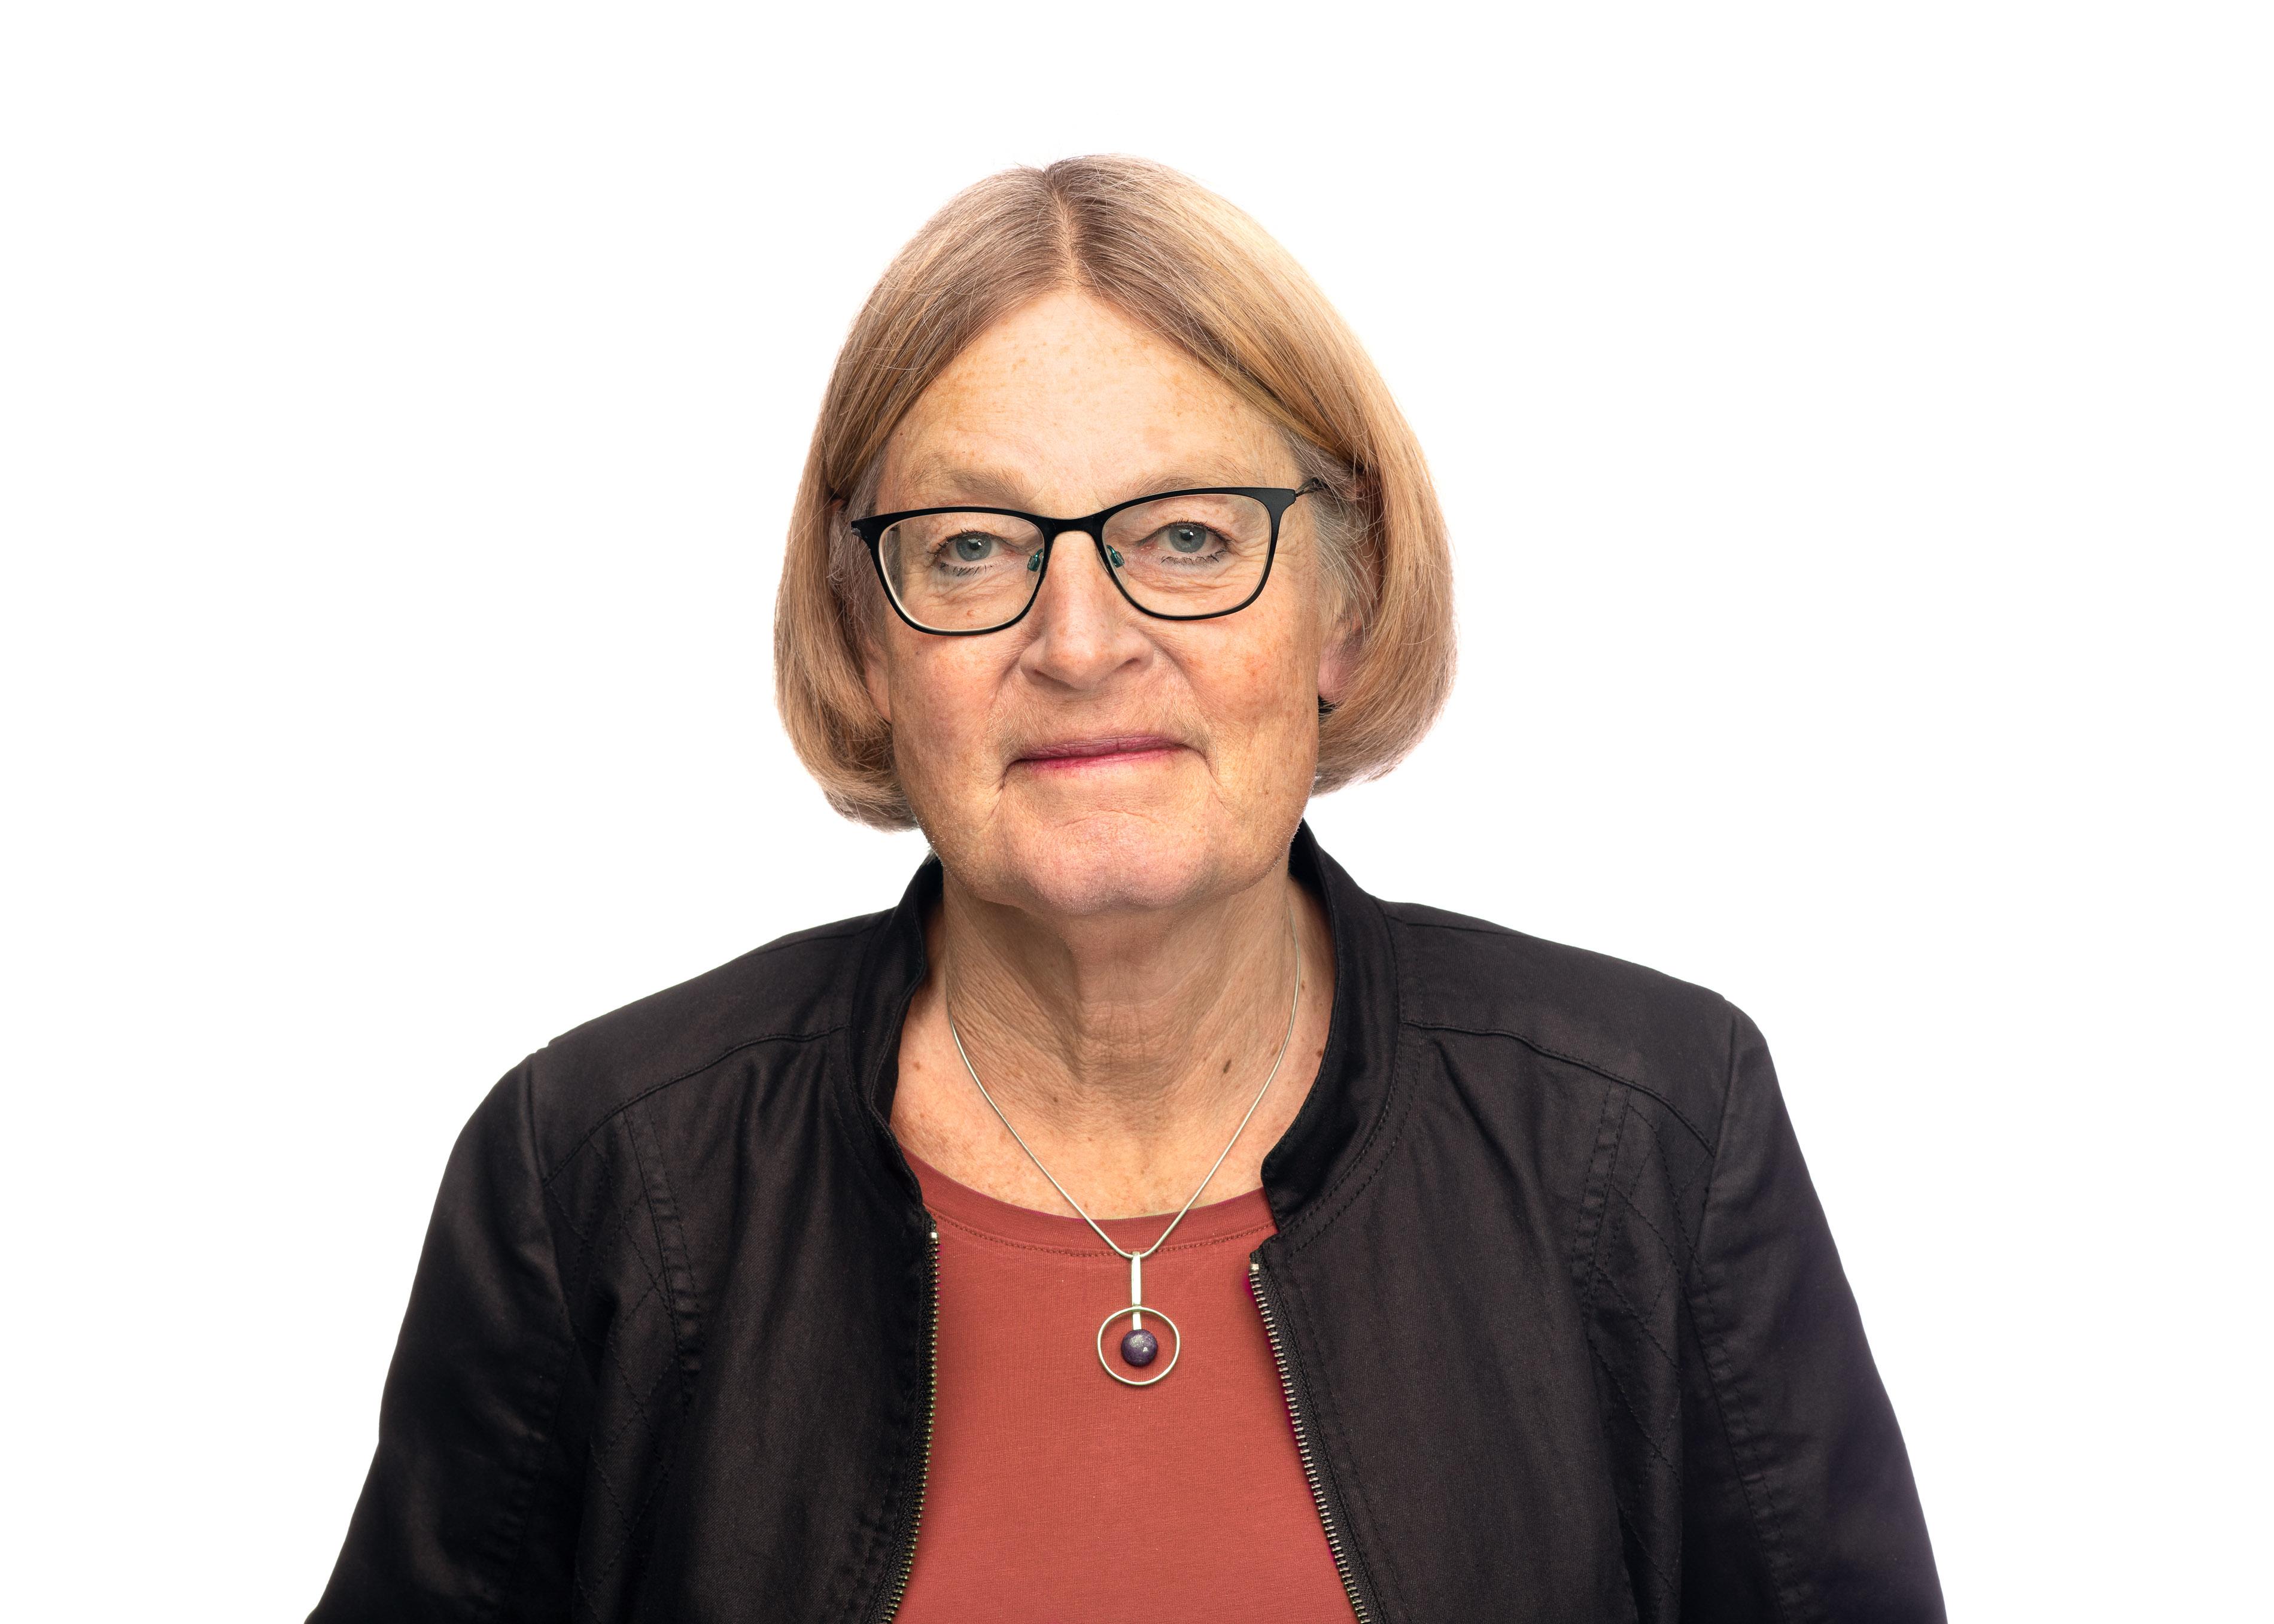 Lena Sörensen